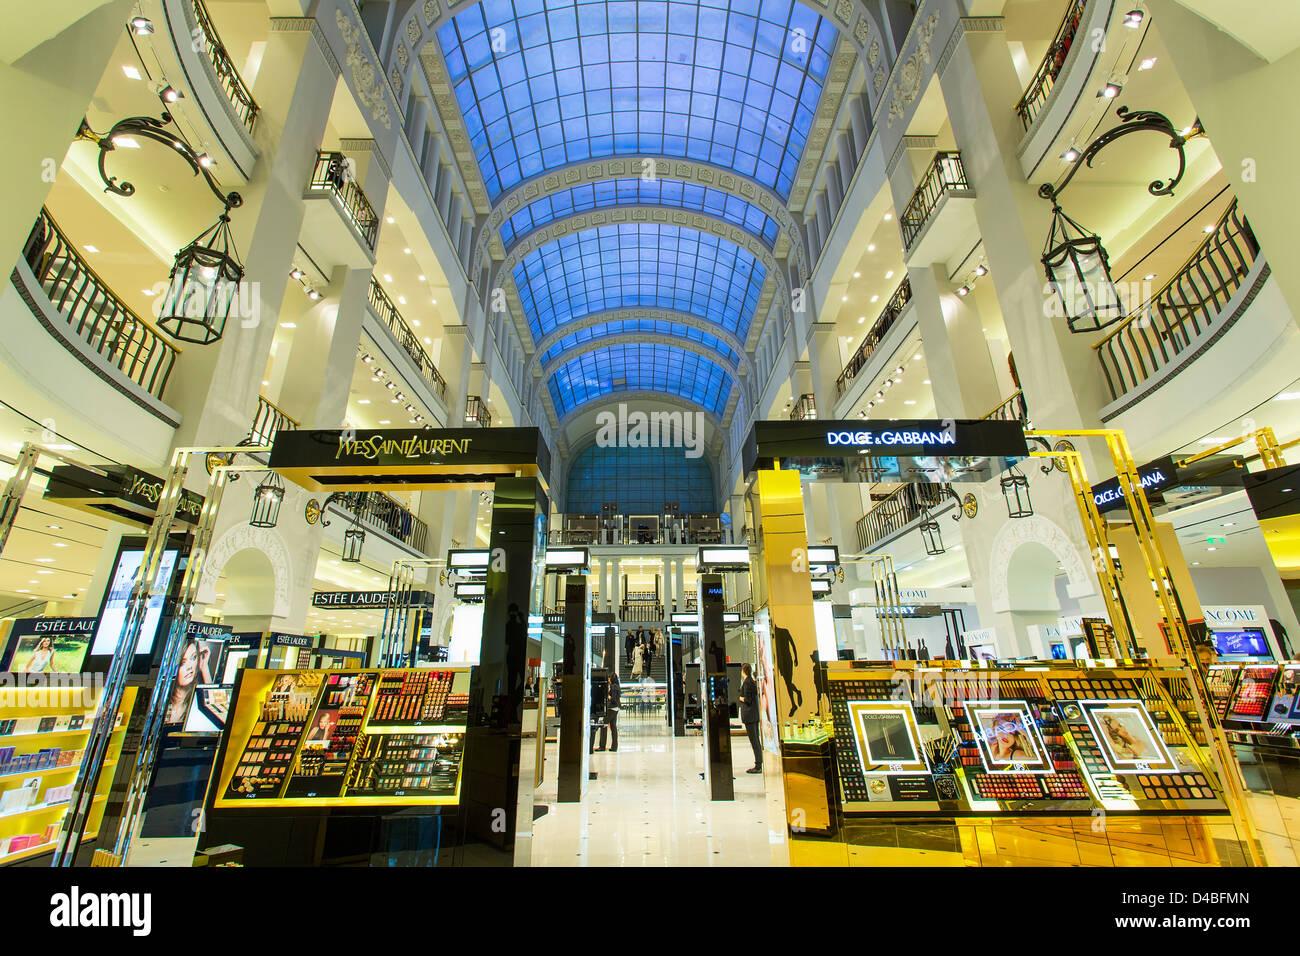 St. Petersburg, DLT department Store - Stock Image